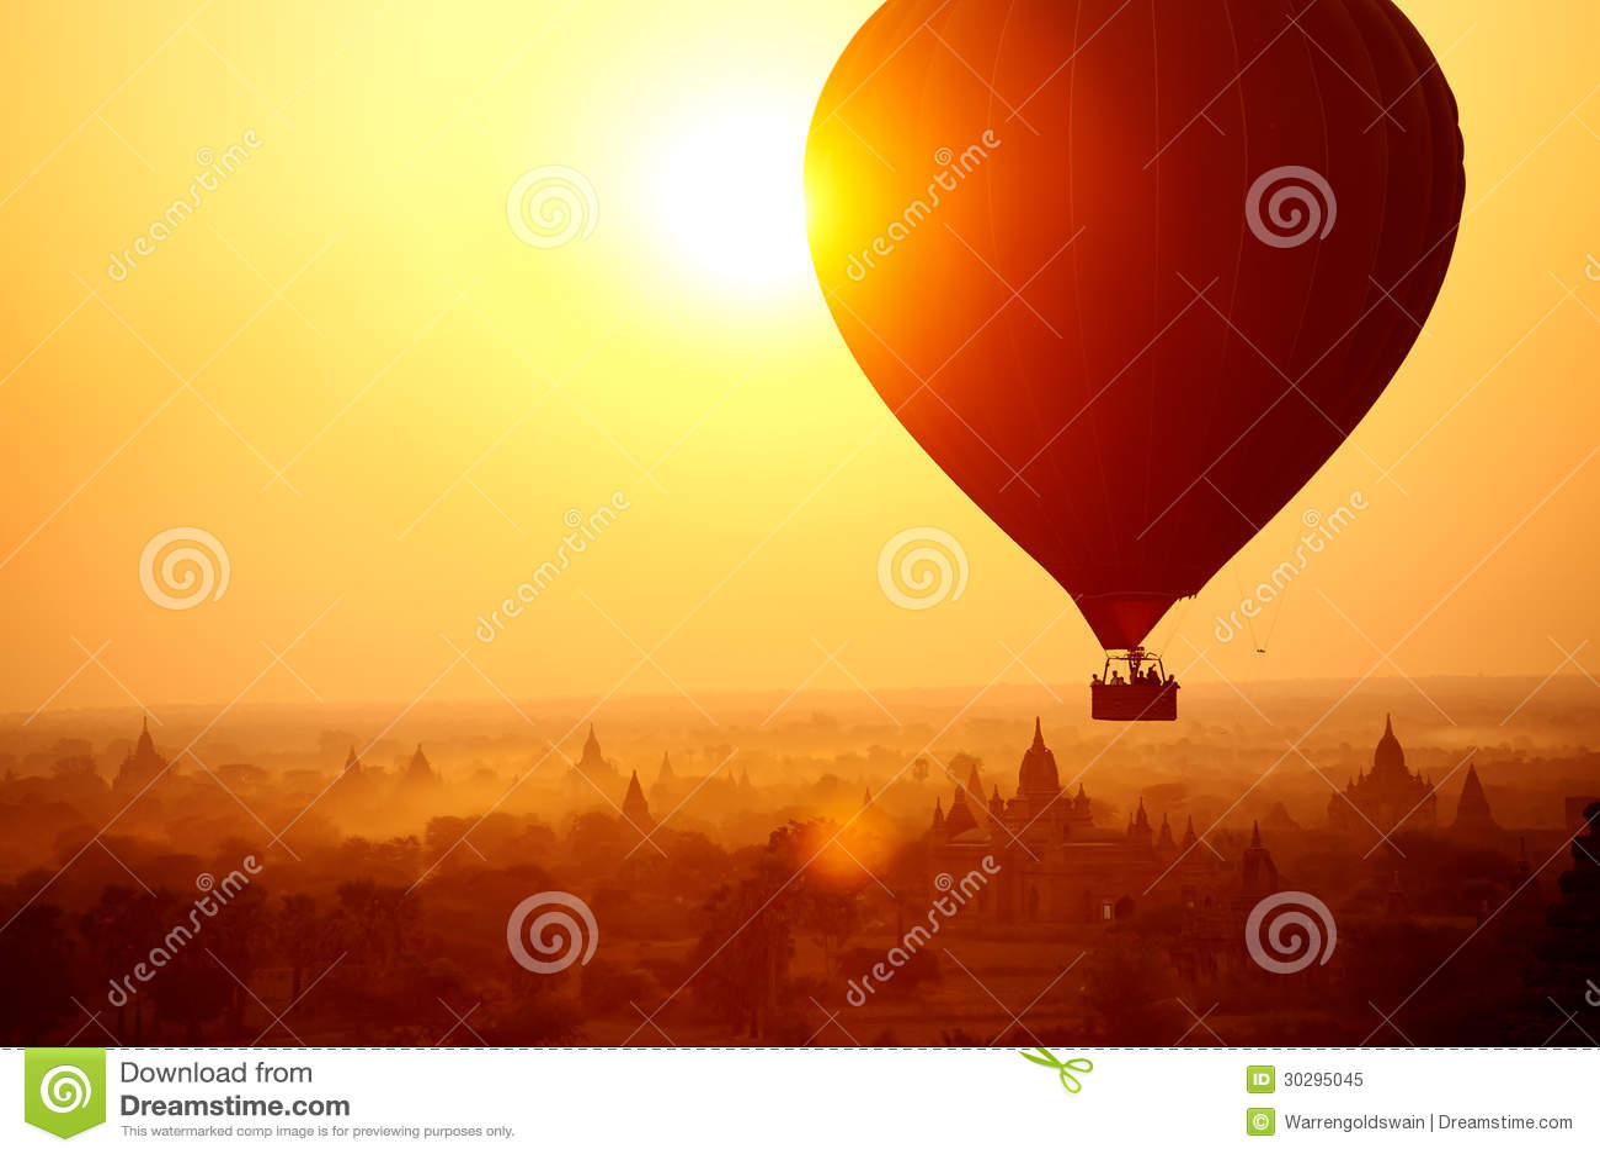 Bagan Balloon